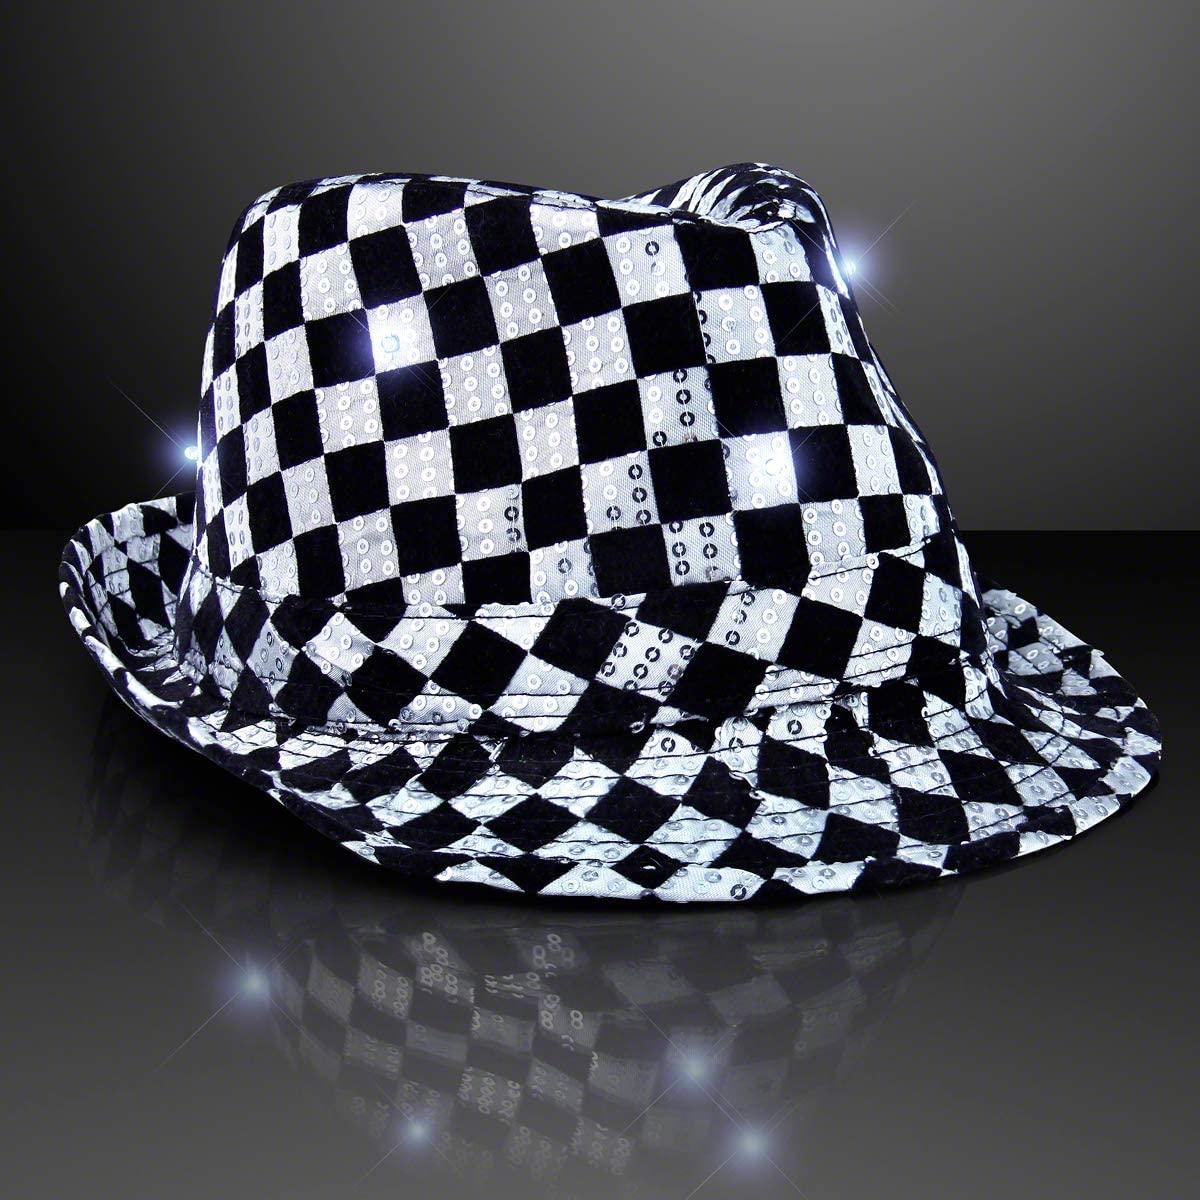 FlashingBlinkyLights Checkered Sequin Light Up LED Fedora Hat